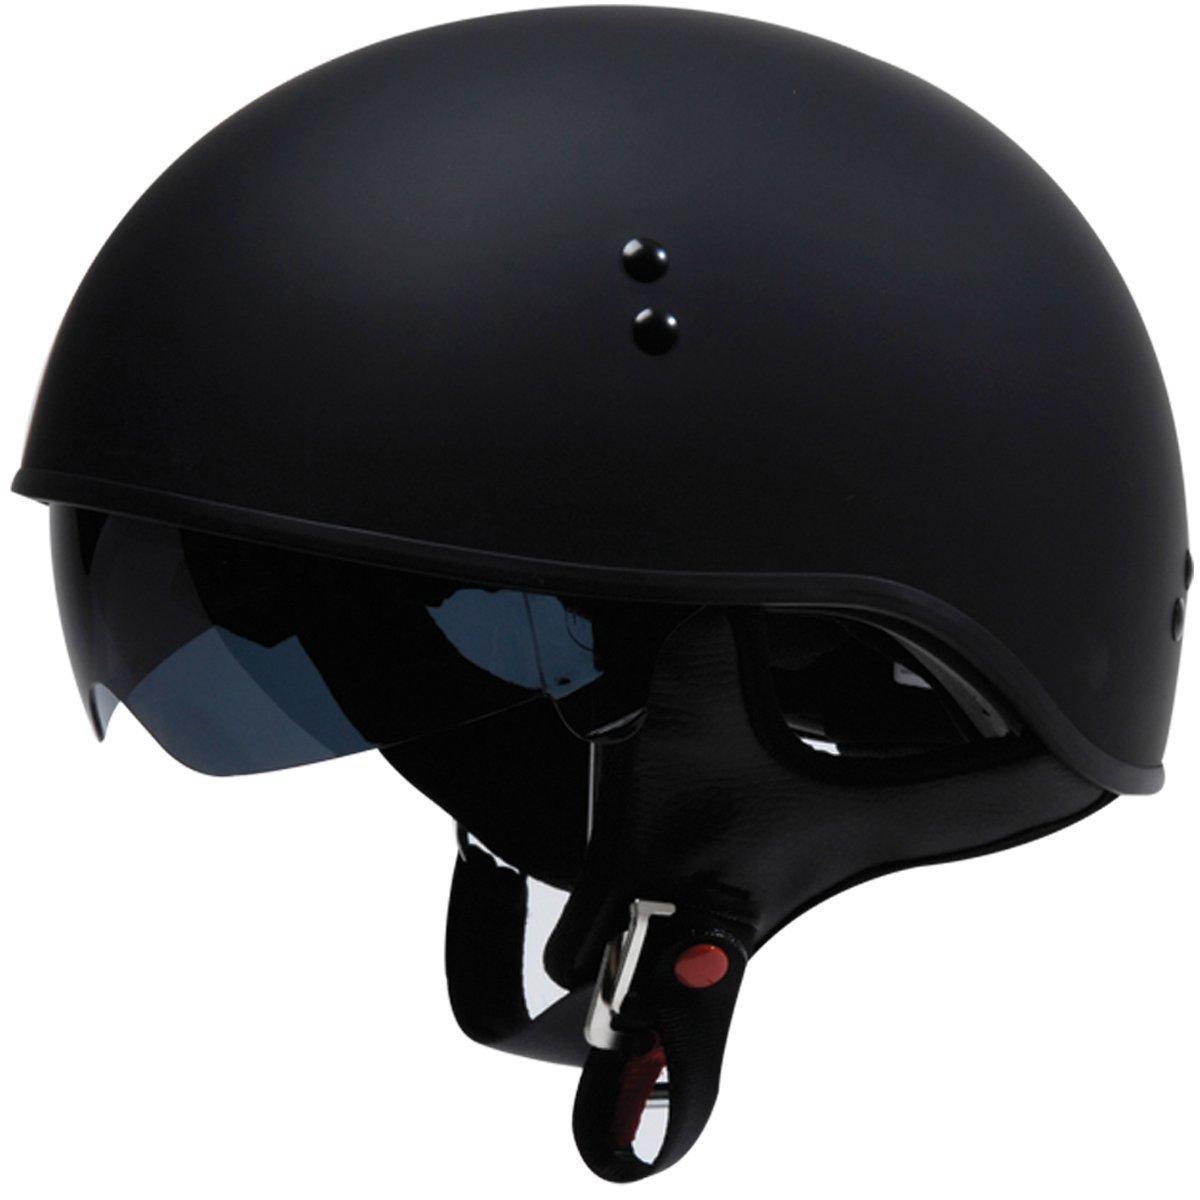 19bebcc8 TORC T55 Spec-Op Motorcycle Half Helmet with Drop-Down Sun Visor (Solid